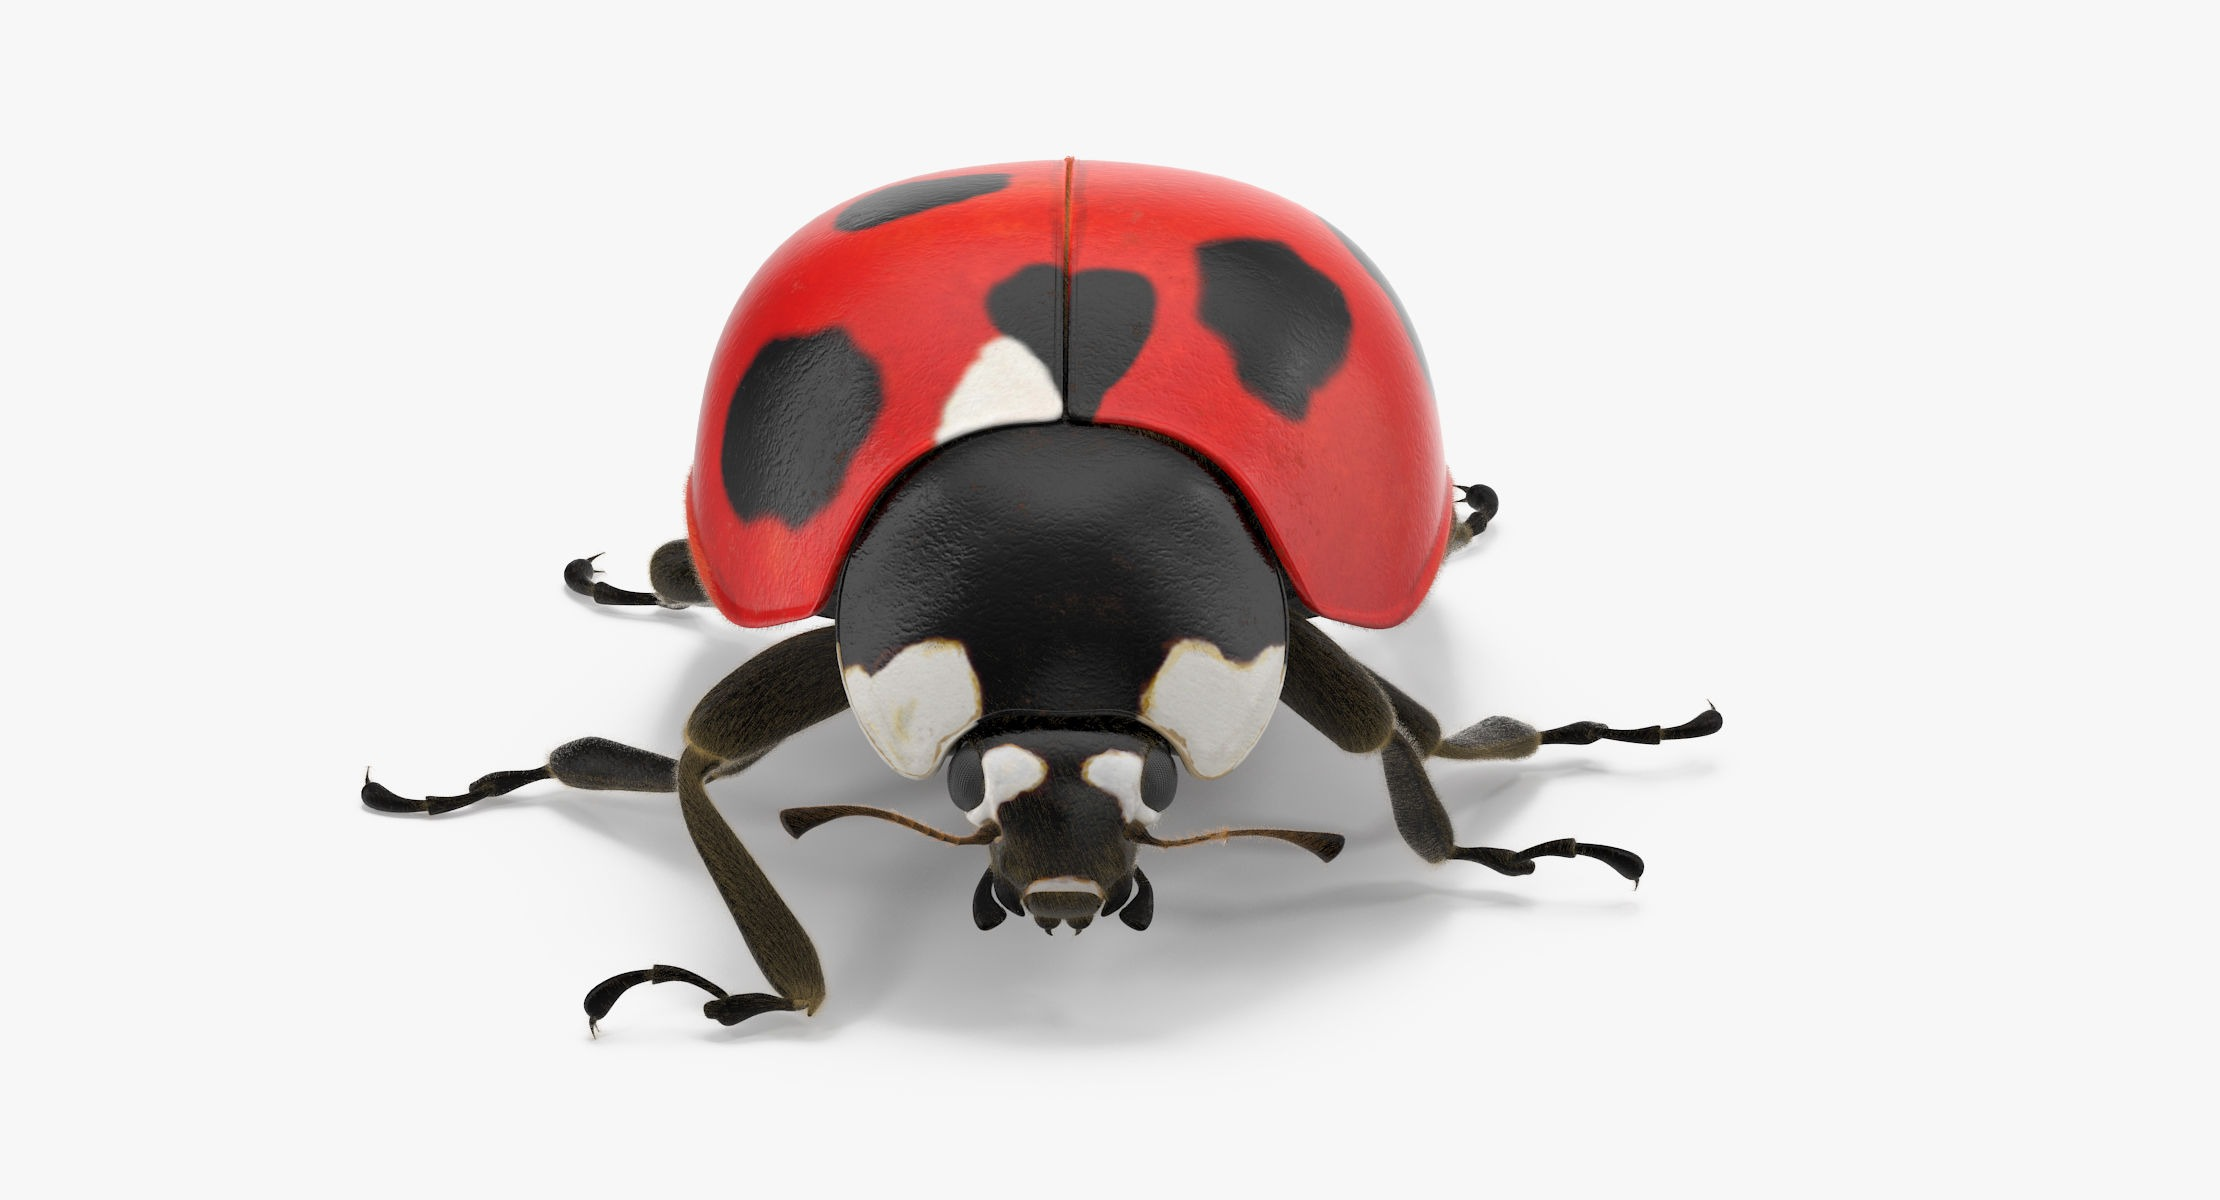 Ladybug 03 - reel 1